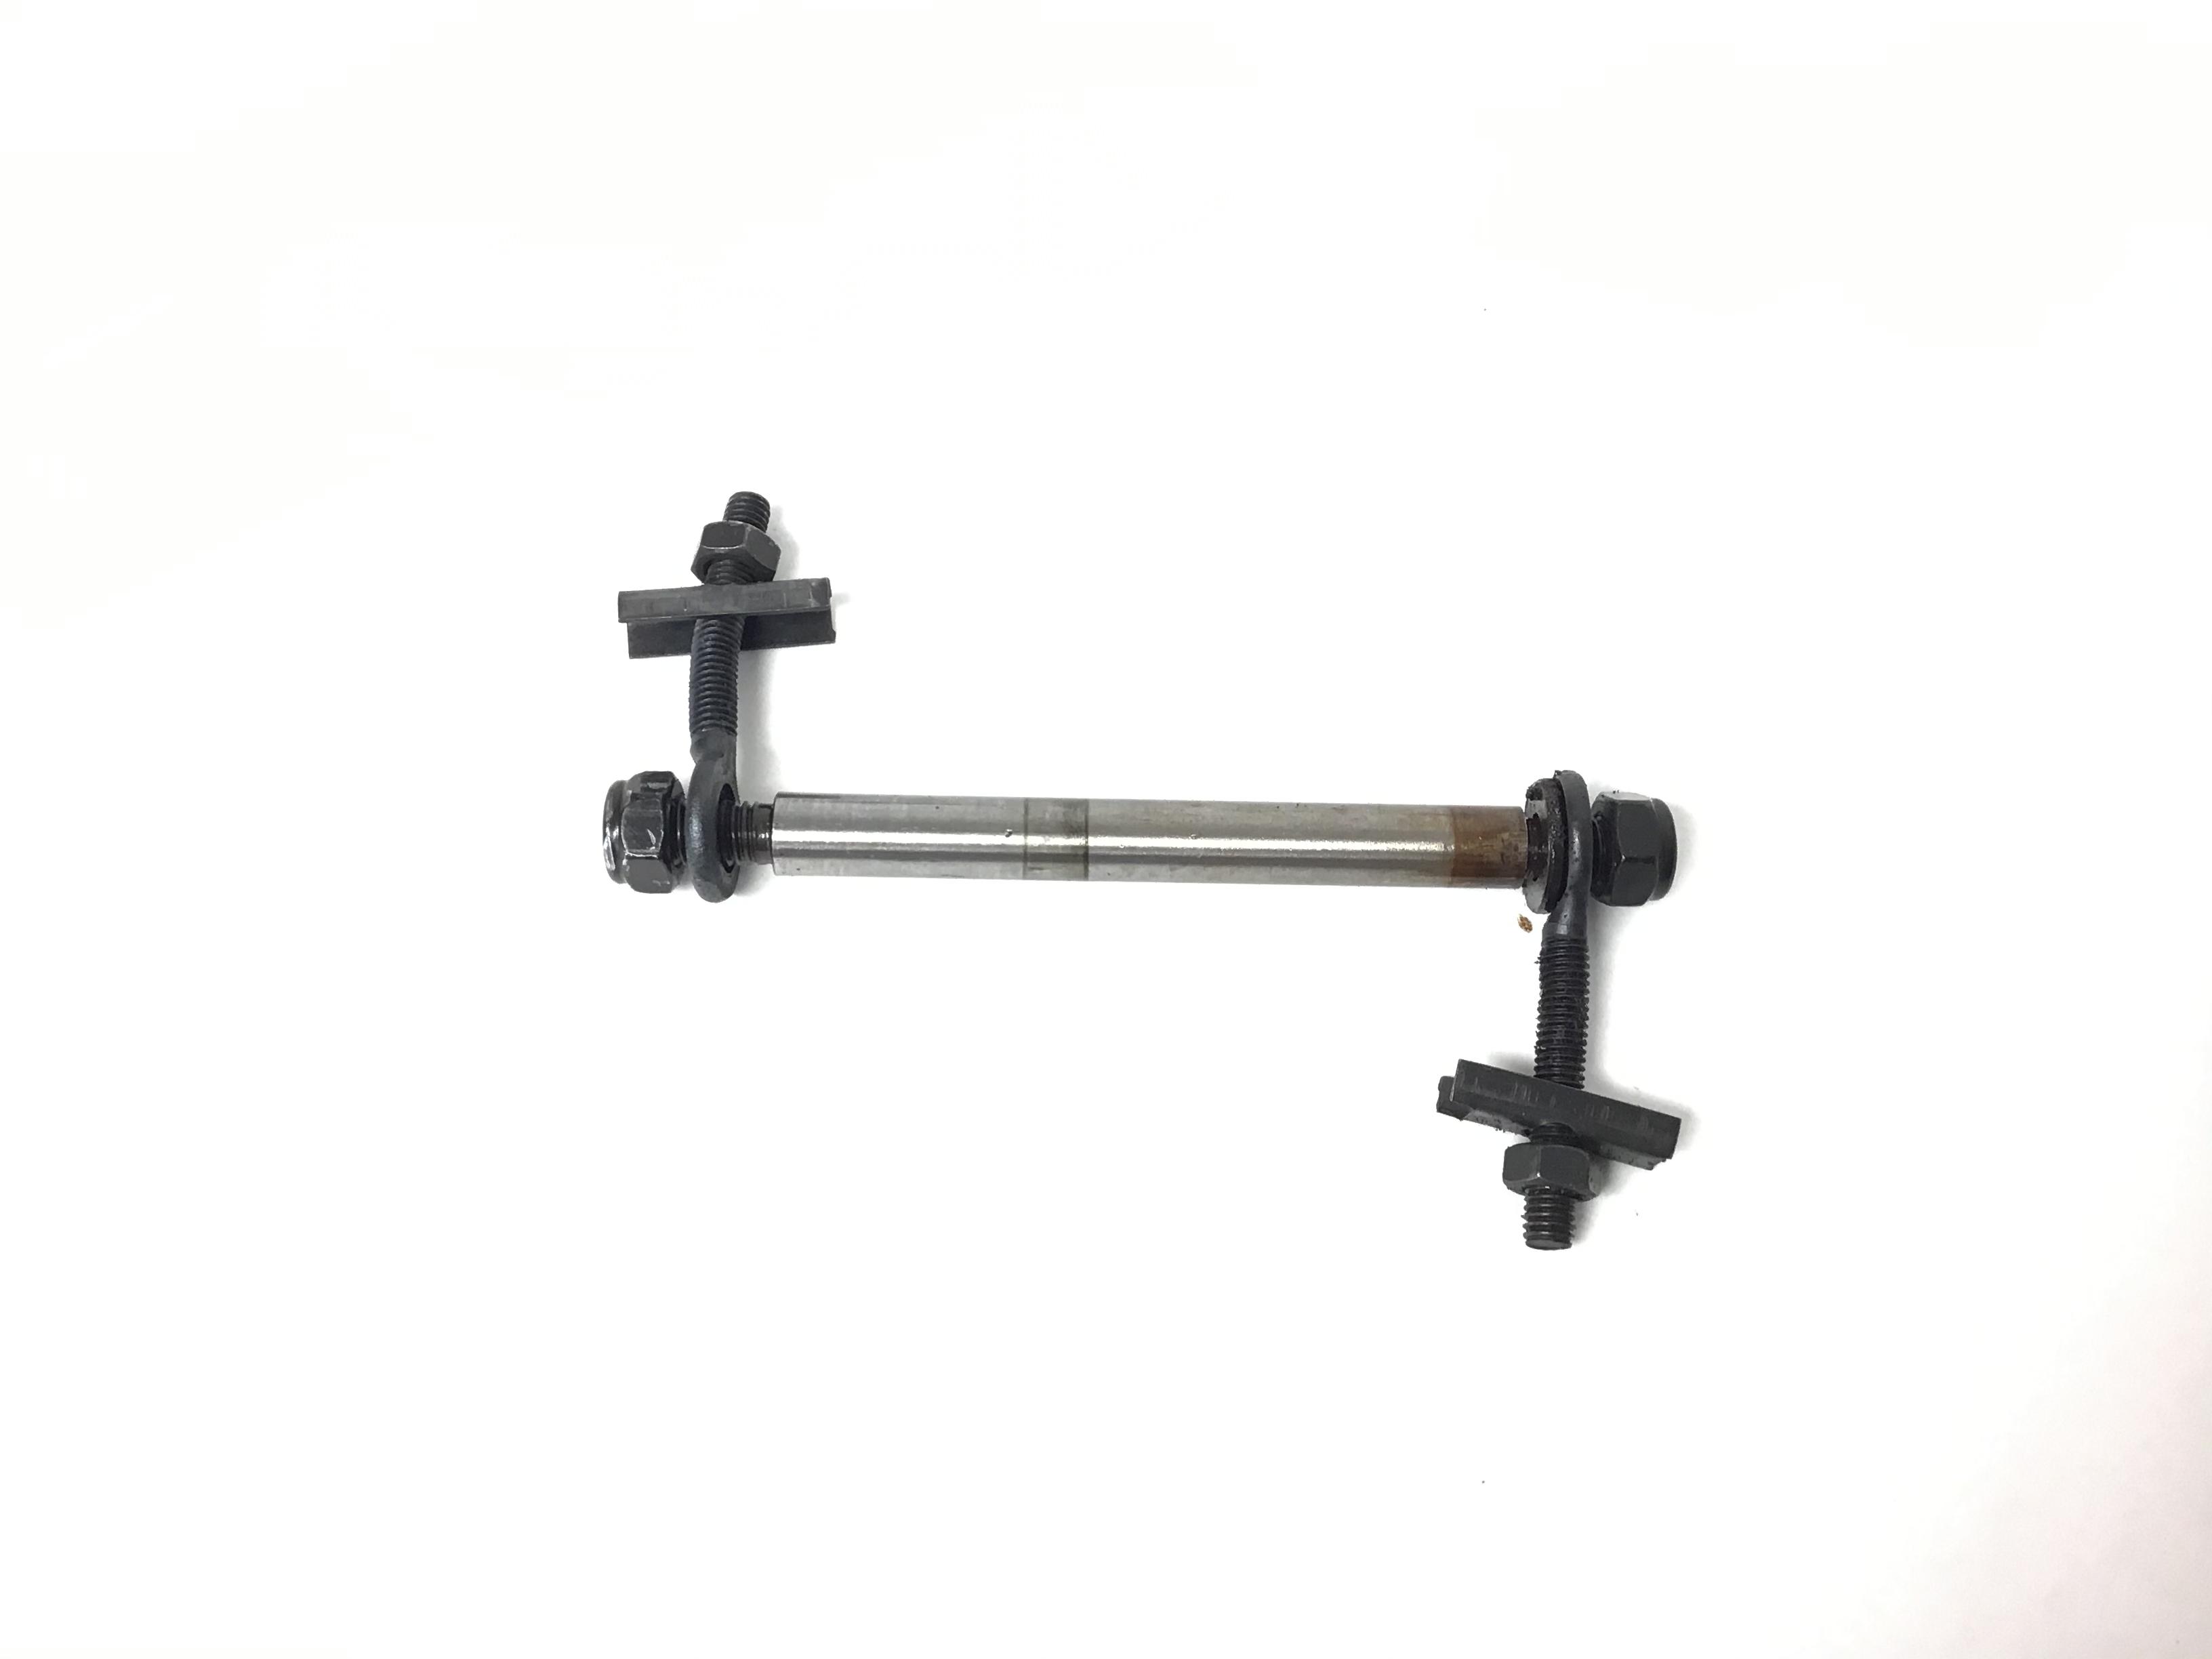 Axle-925R